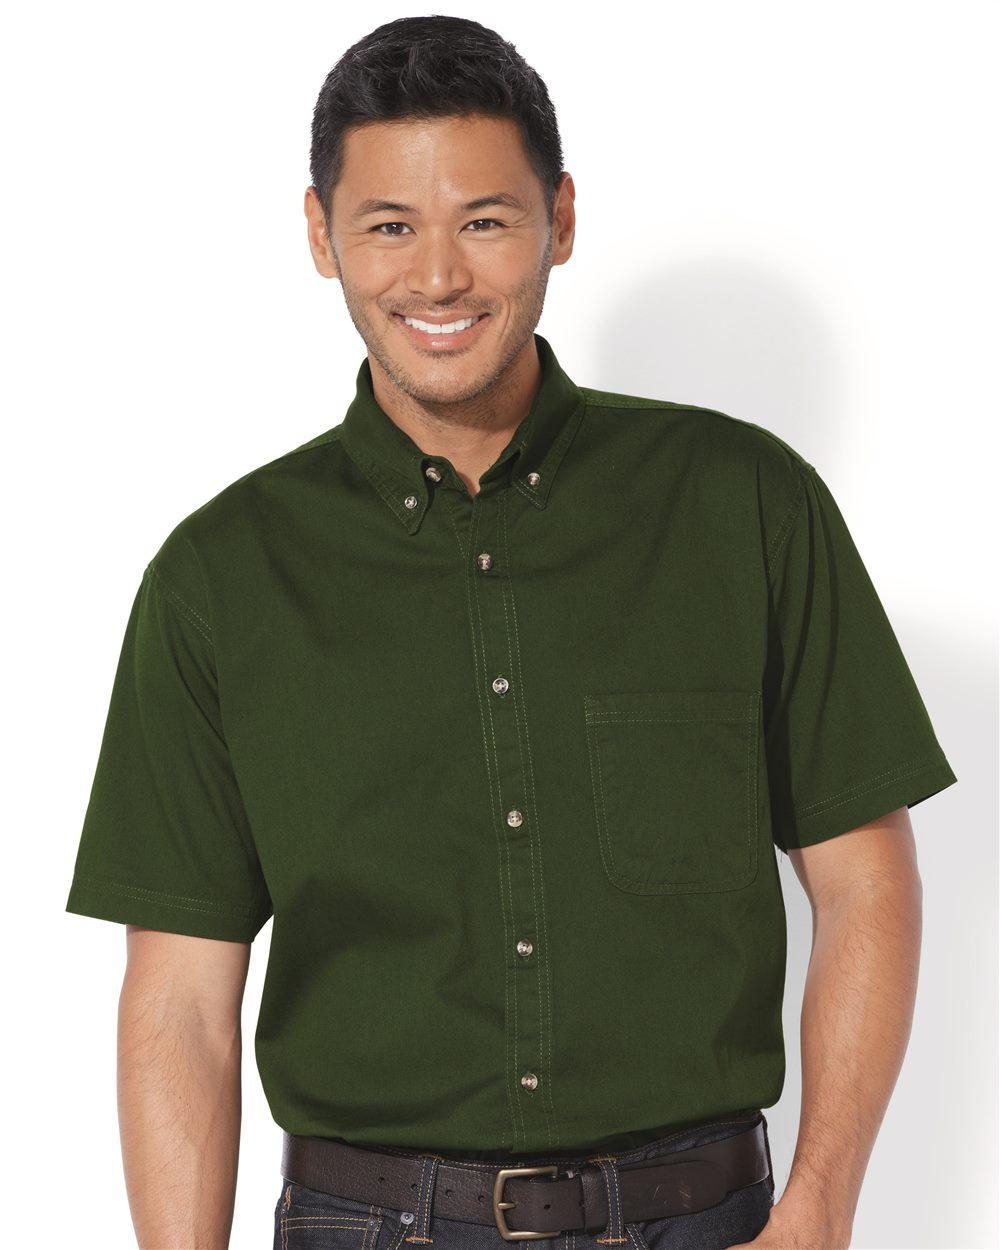 Sierra Pacific 0201 Short Sleeve Cotton Twill